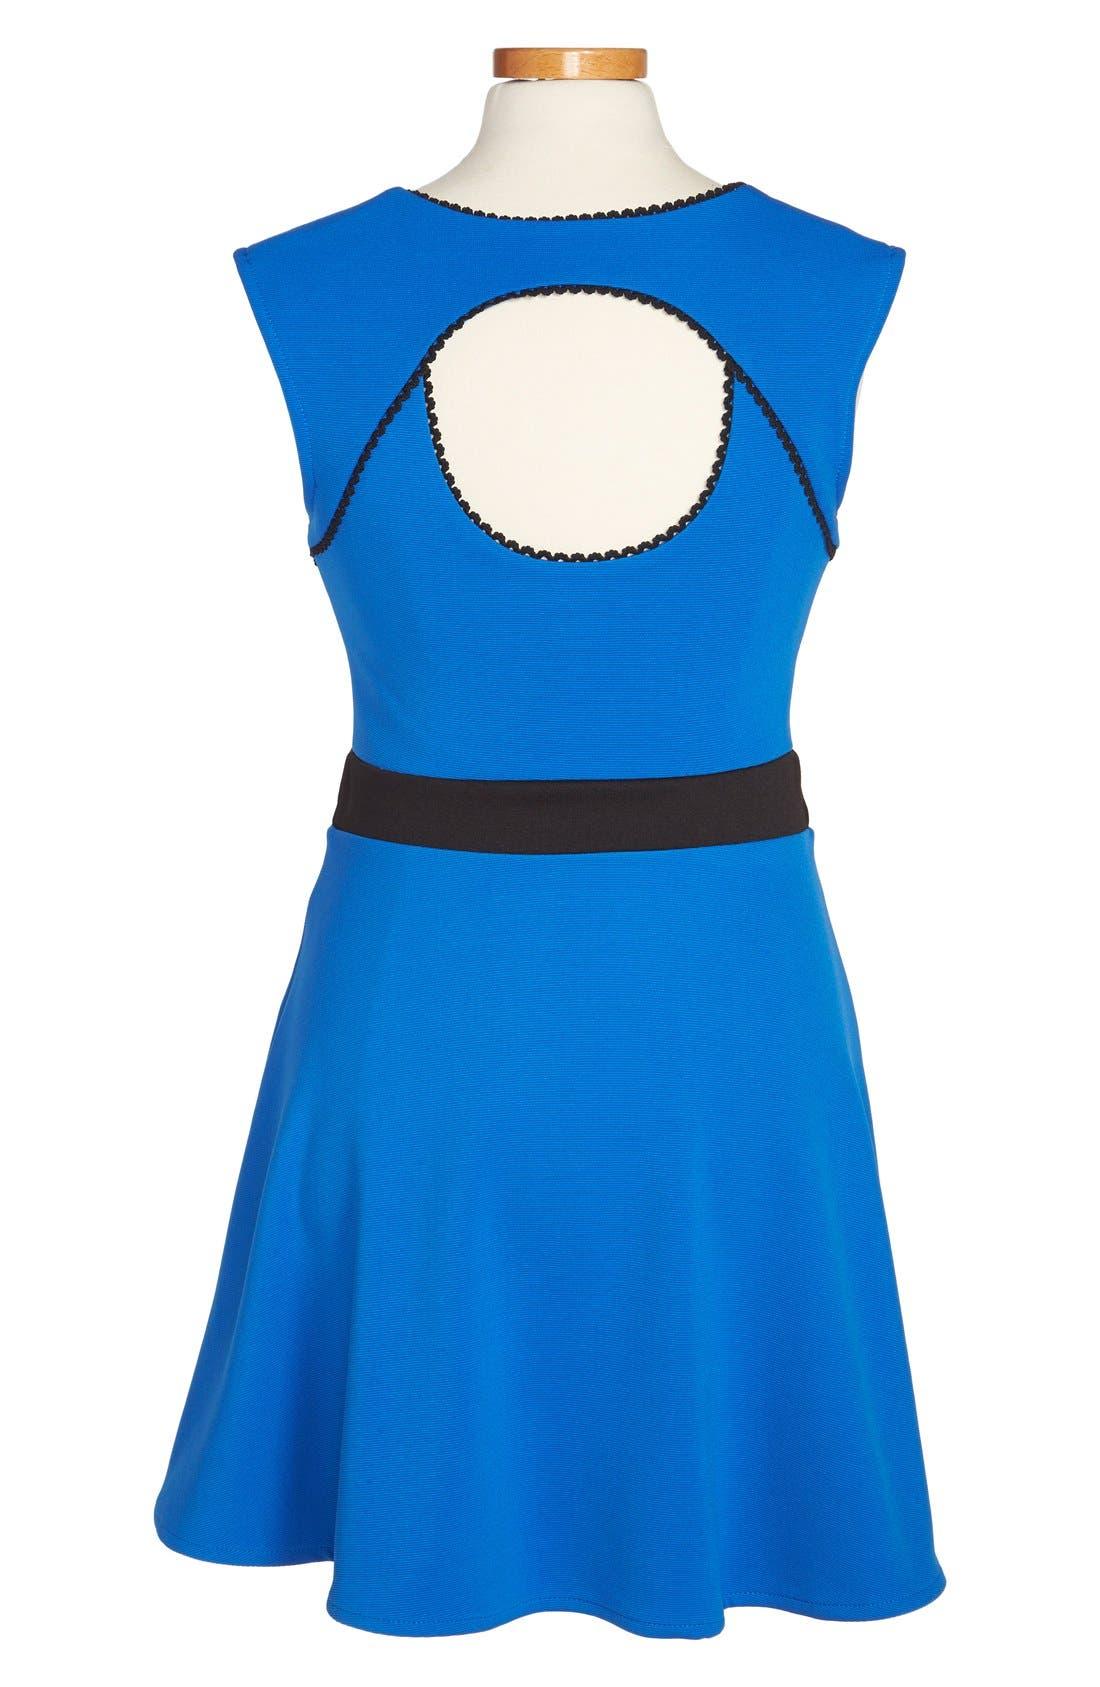 Alternate Image 2  - Sally Miller 'Chloe' Dress (Big Girls)